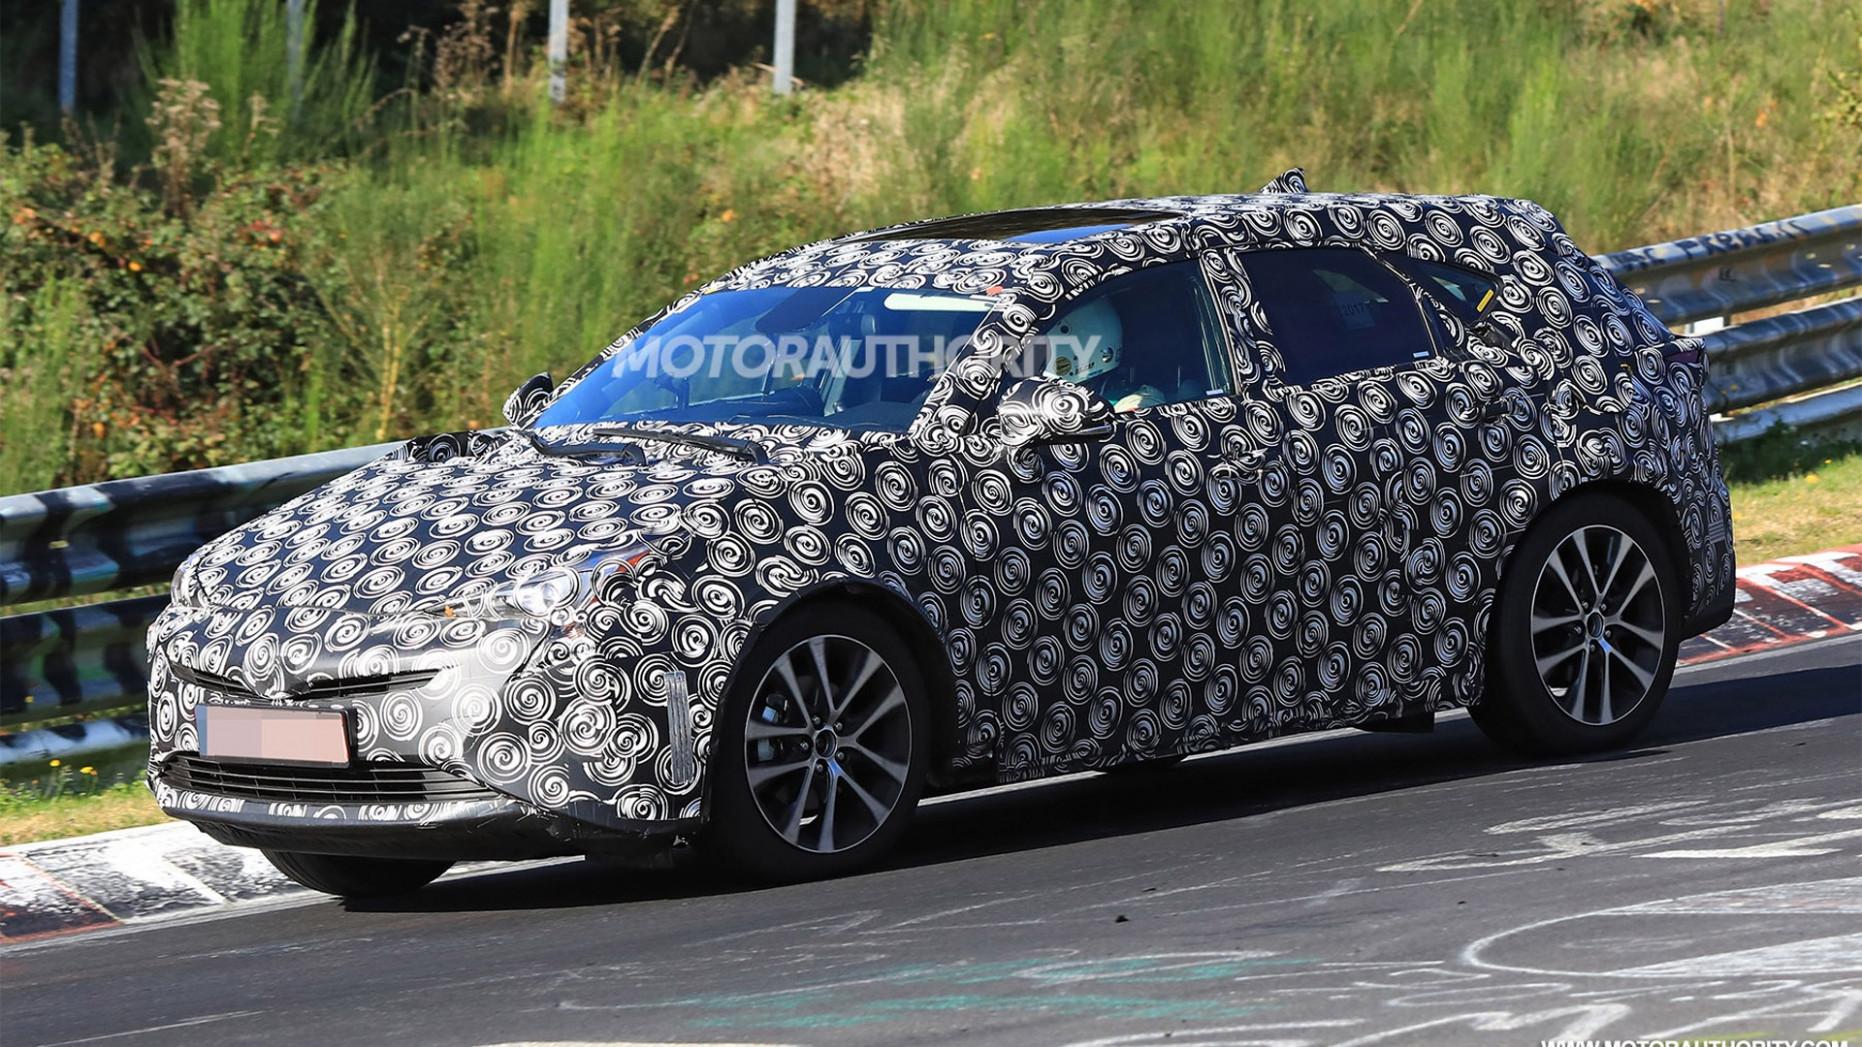 Spesification 2022 Spy Shots Toyota Prius